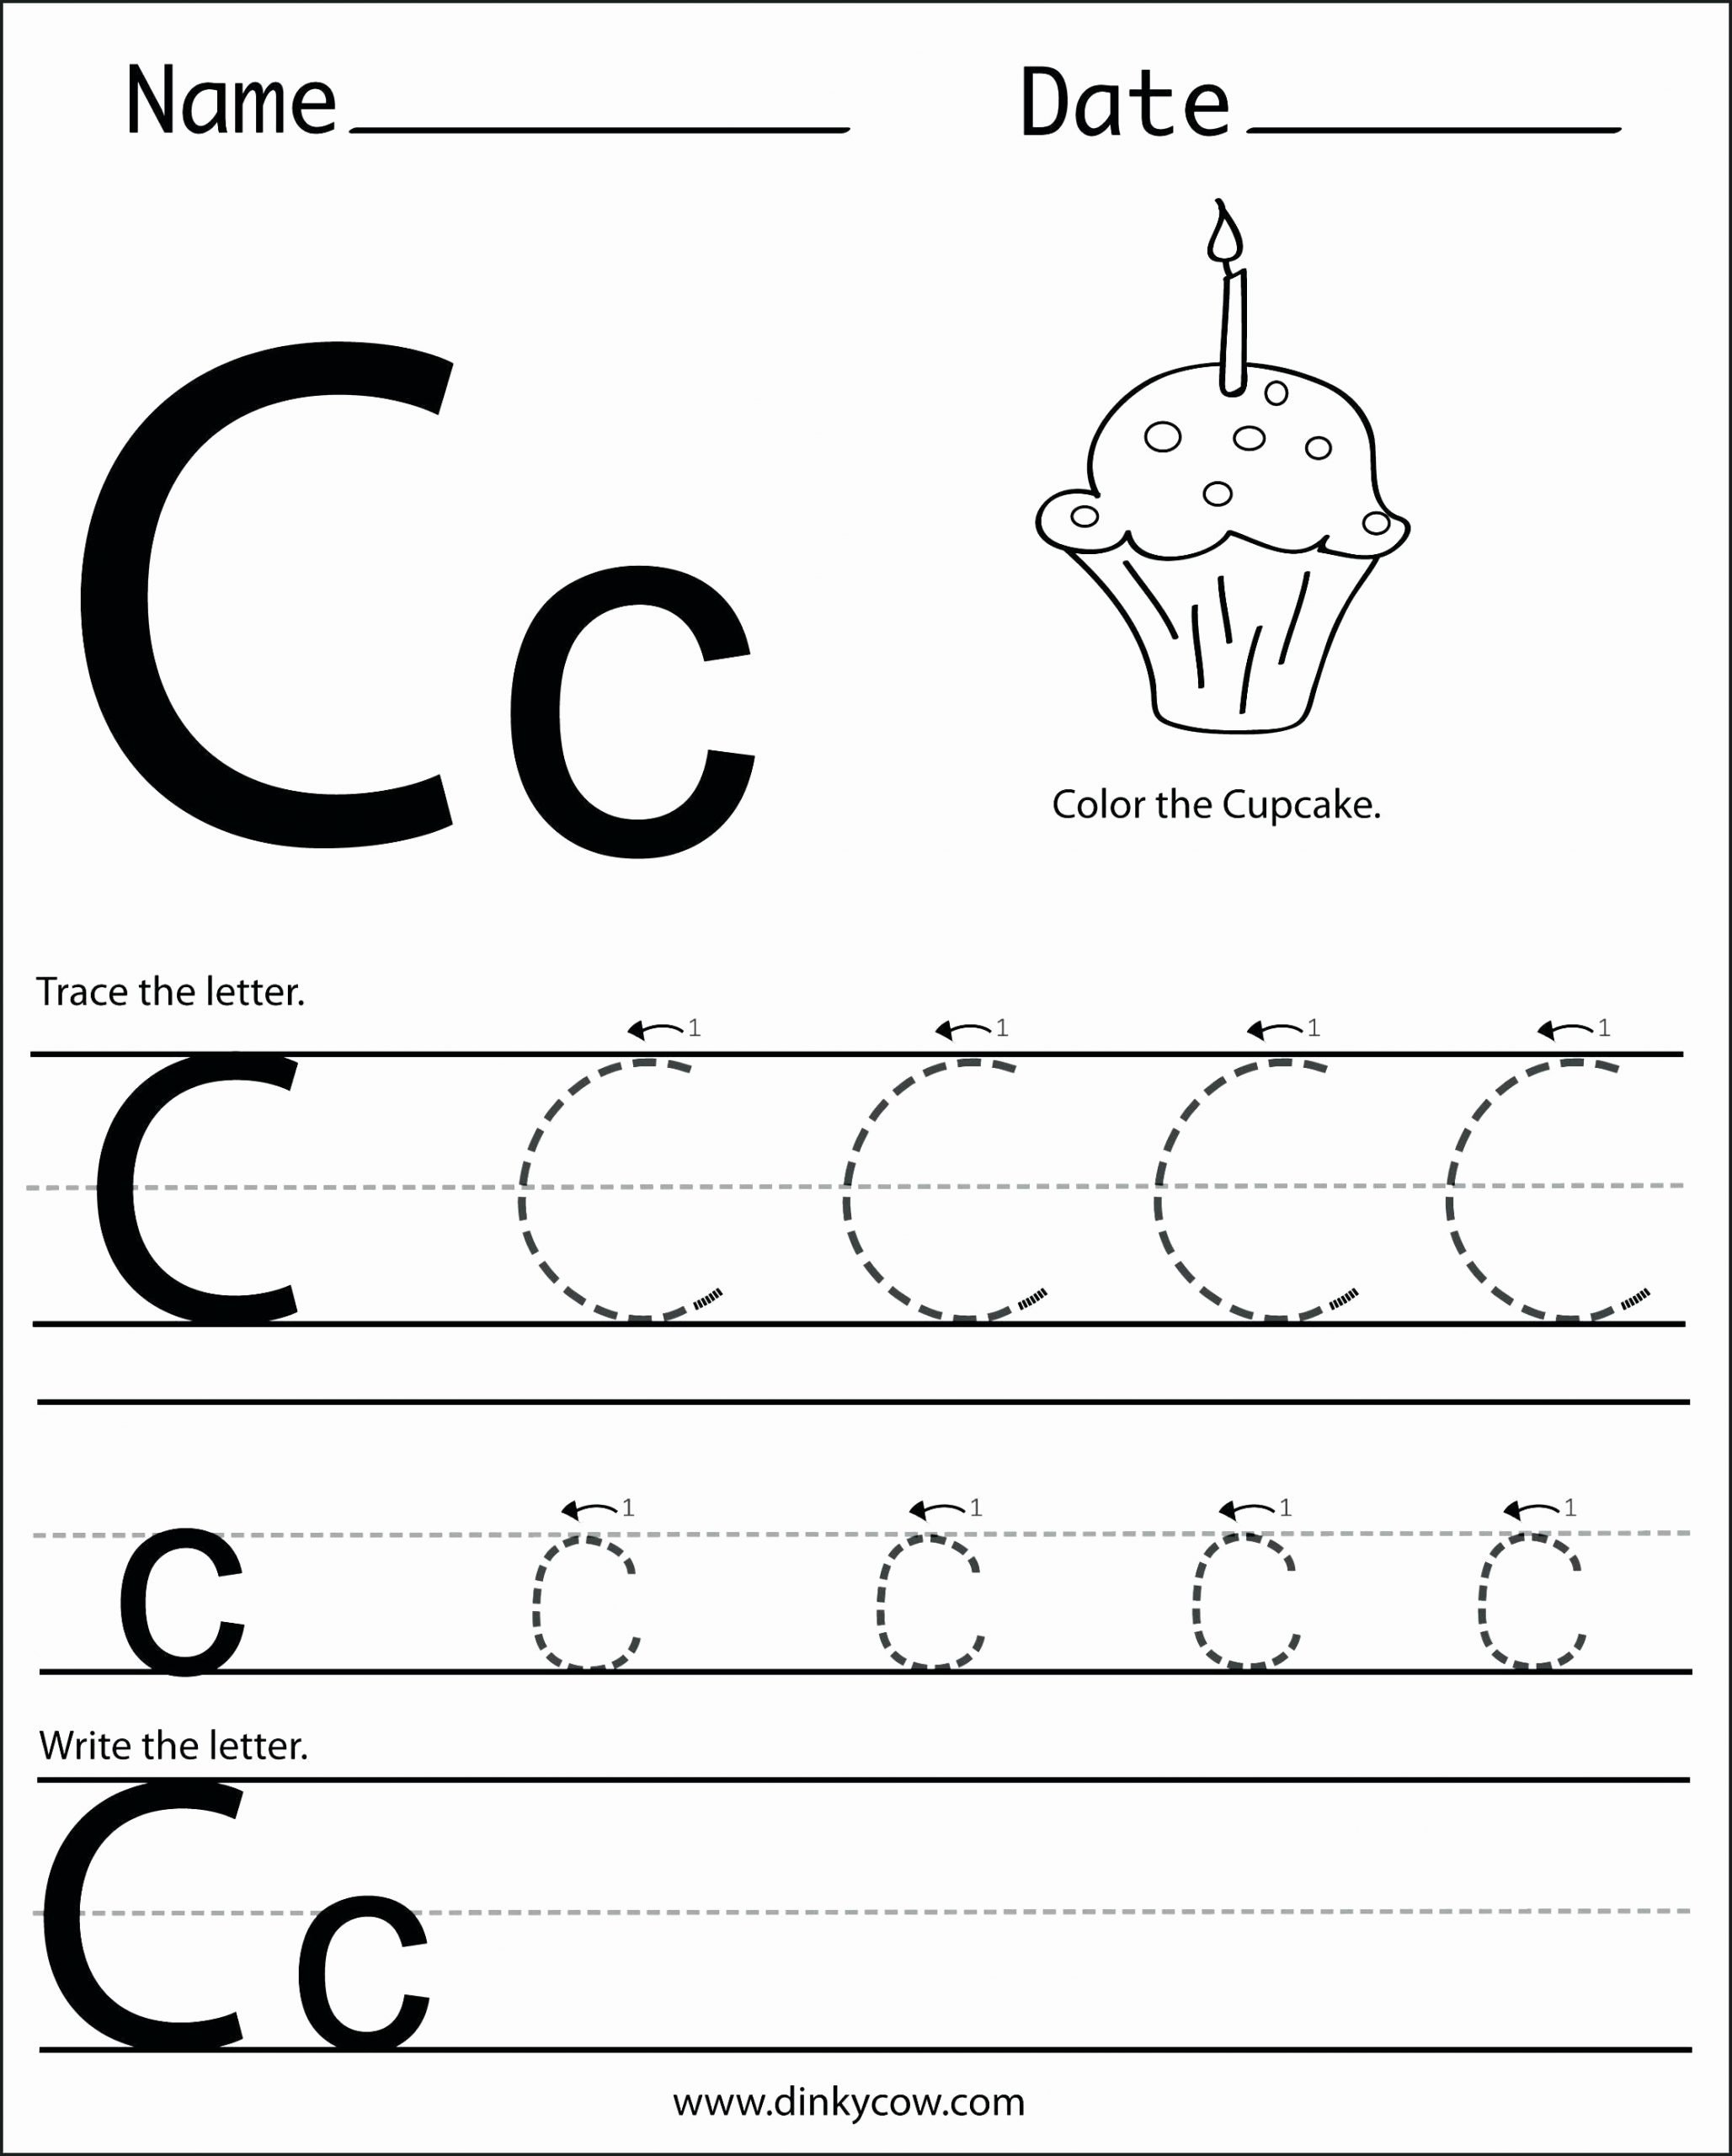 C Worksheets for Preschoolers Lovely Letter C Worksheets to Learning Letter C Worksheets Misc